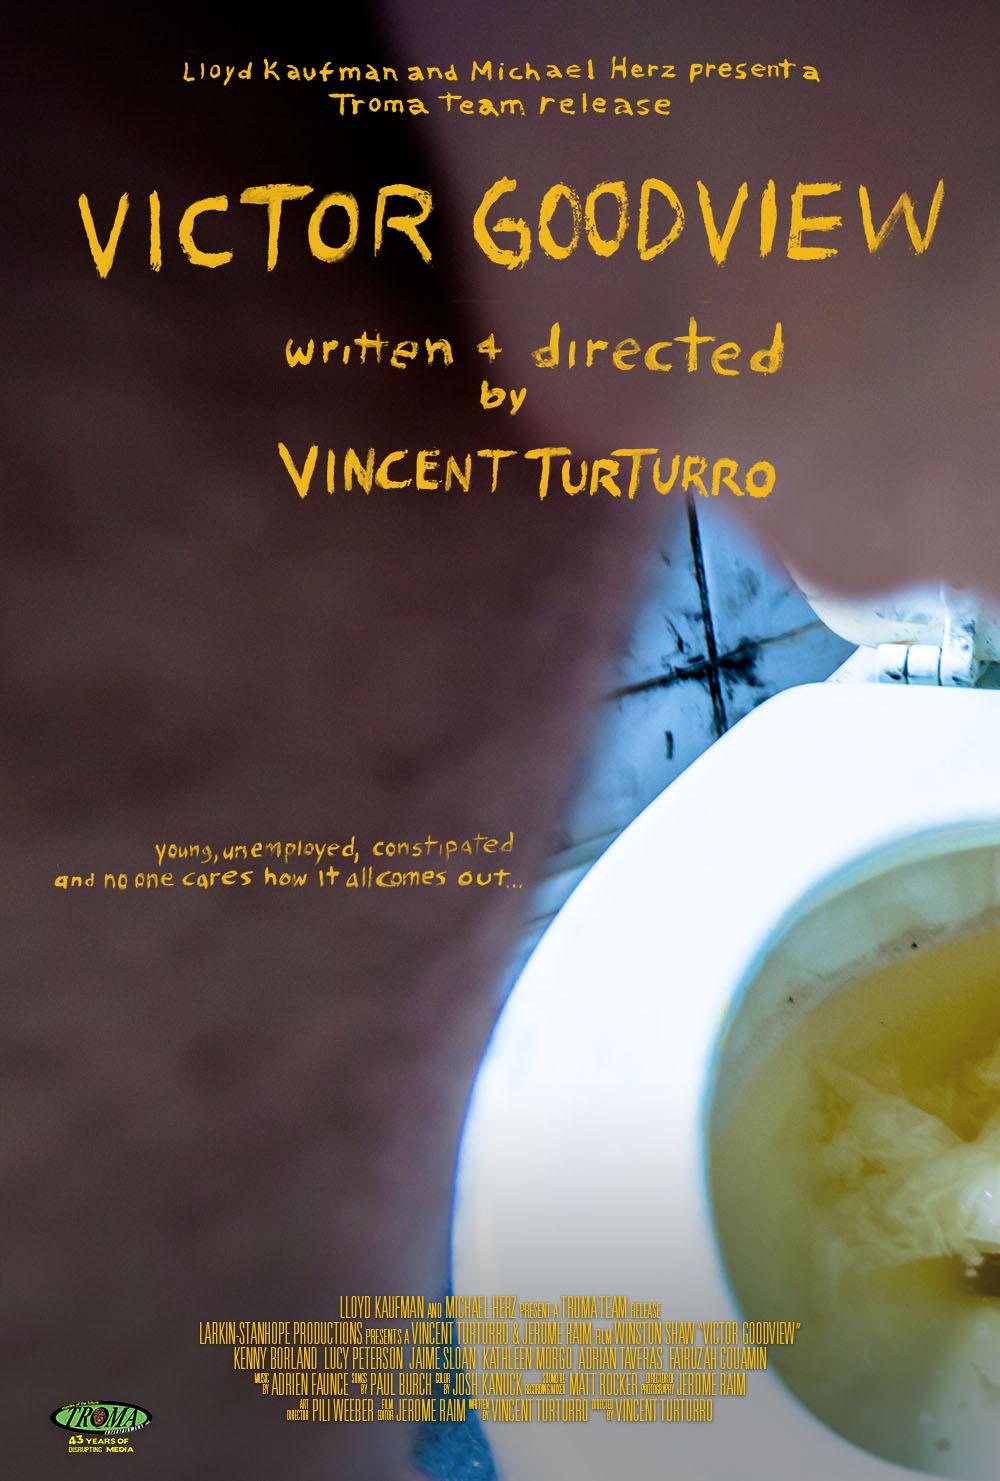 VictorGoodview_Poster02C_handwritten.jpg